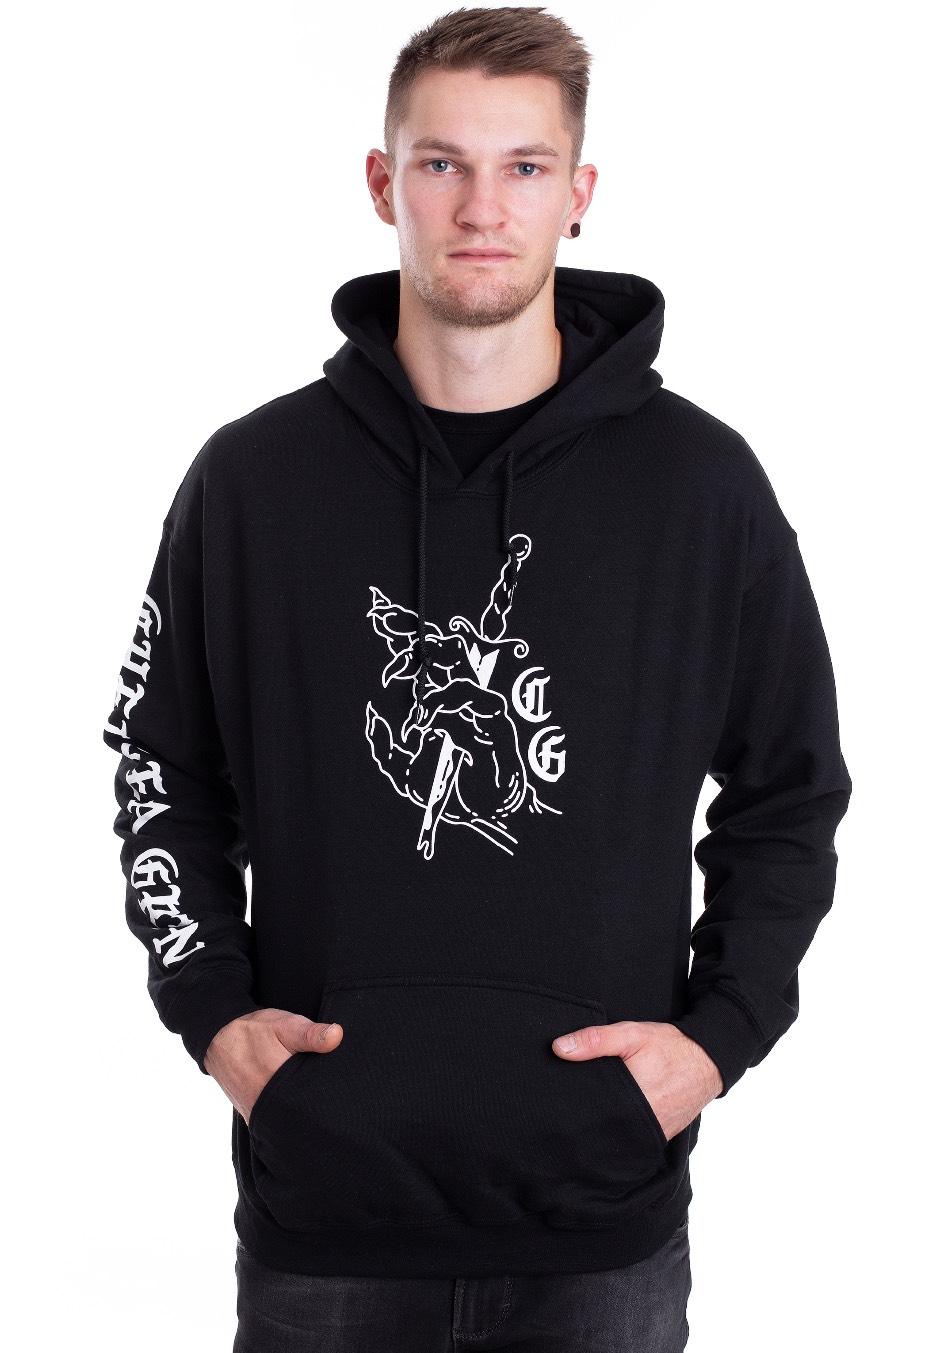 chelsea grin hand hoodie official deathcore merchandise shop uk. Black Bedroom Furniture Sets. Home Design Ideas